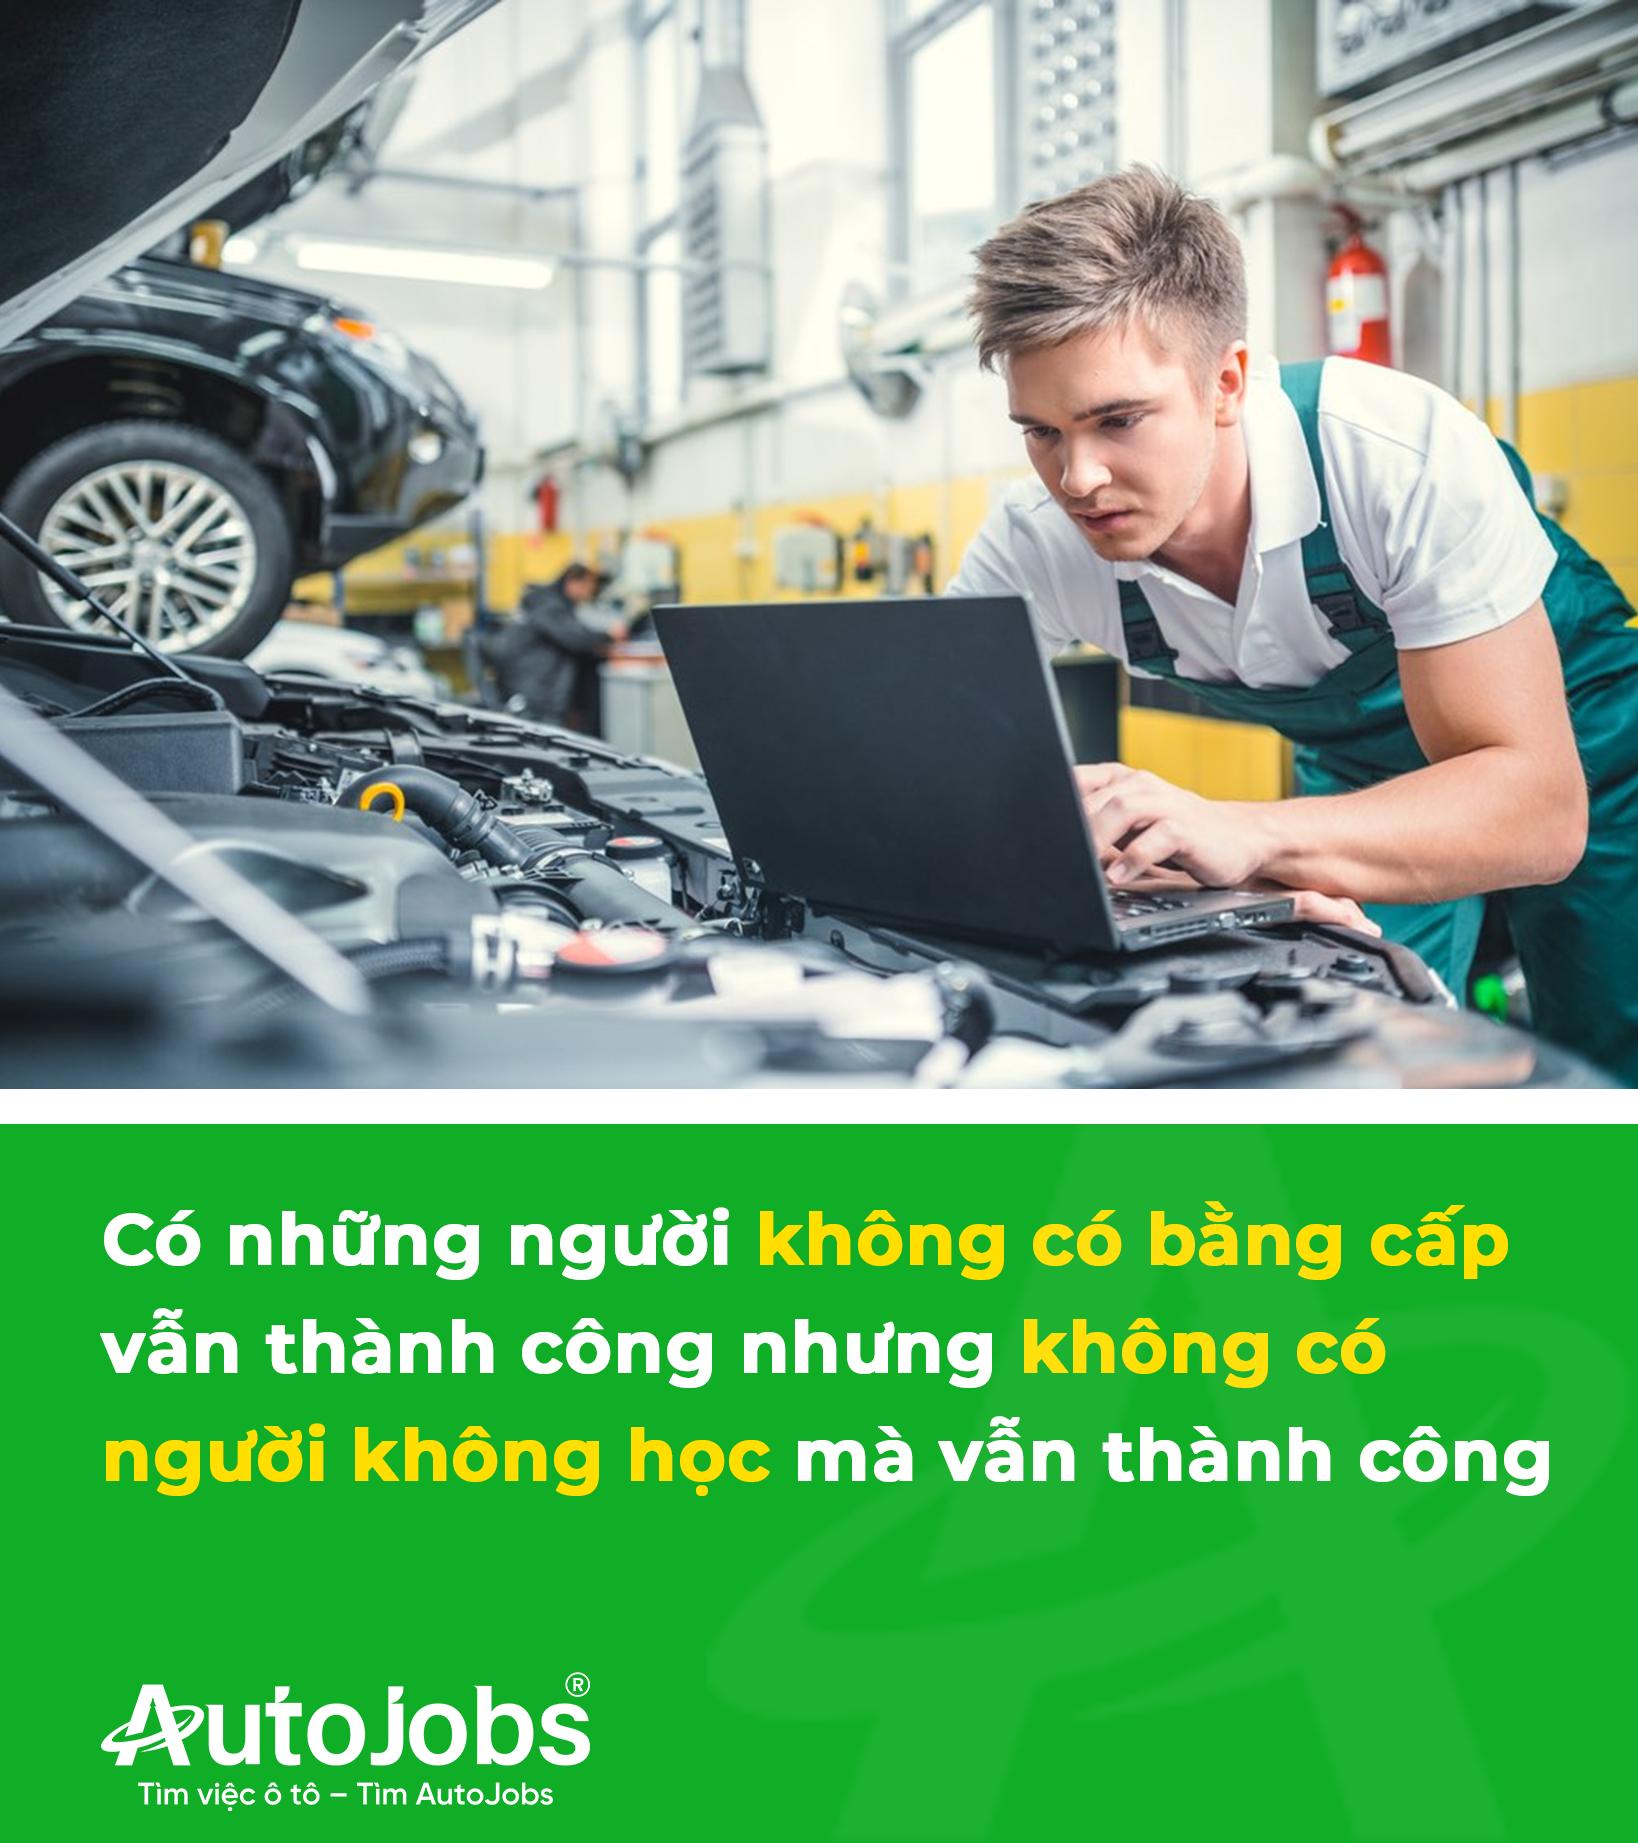 quote-autojobs-31-7.png